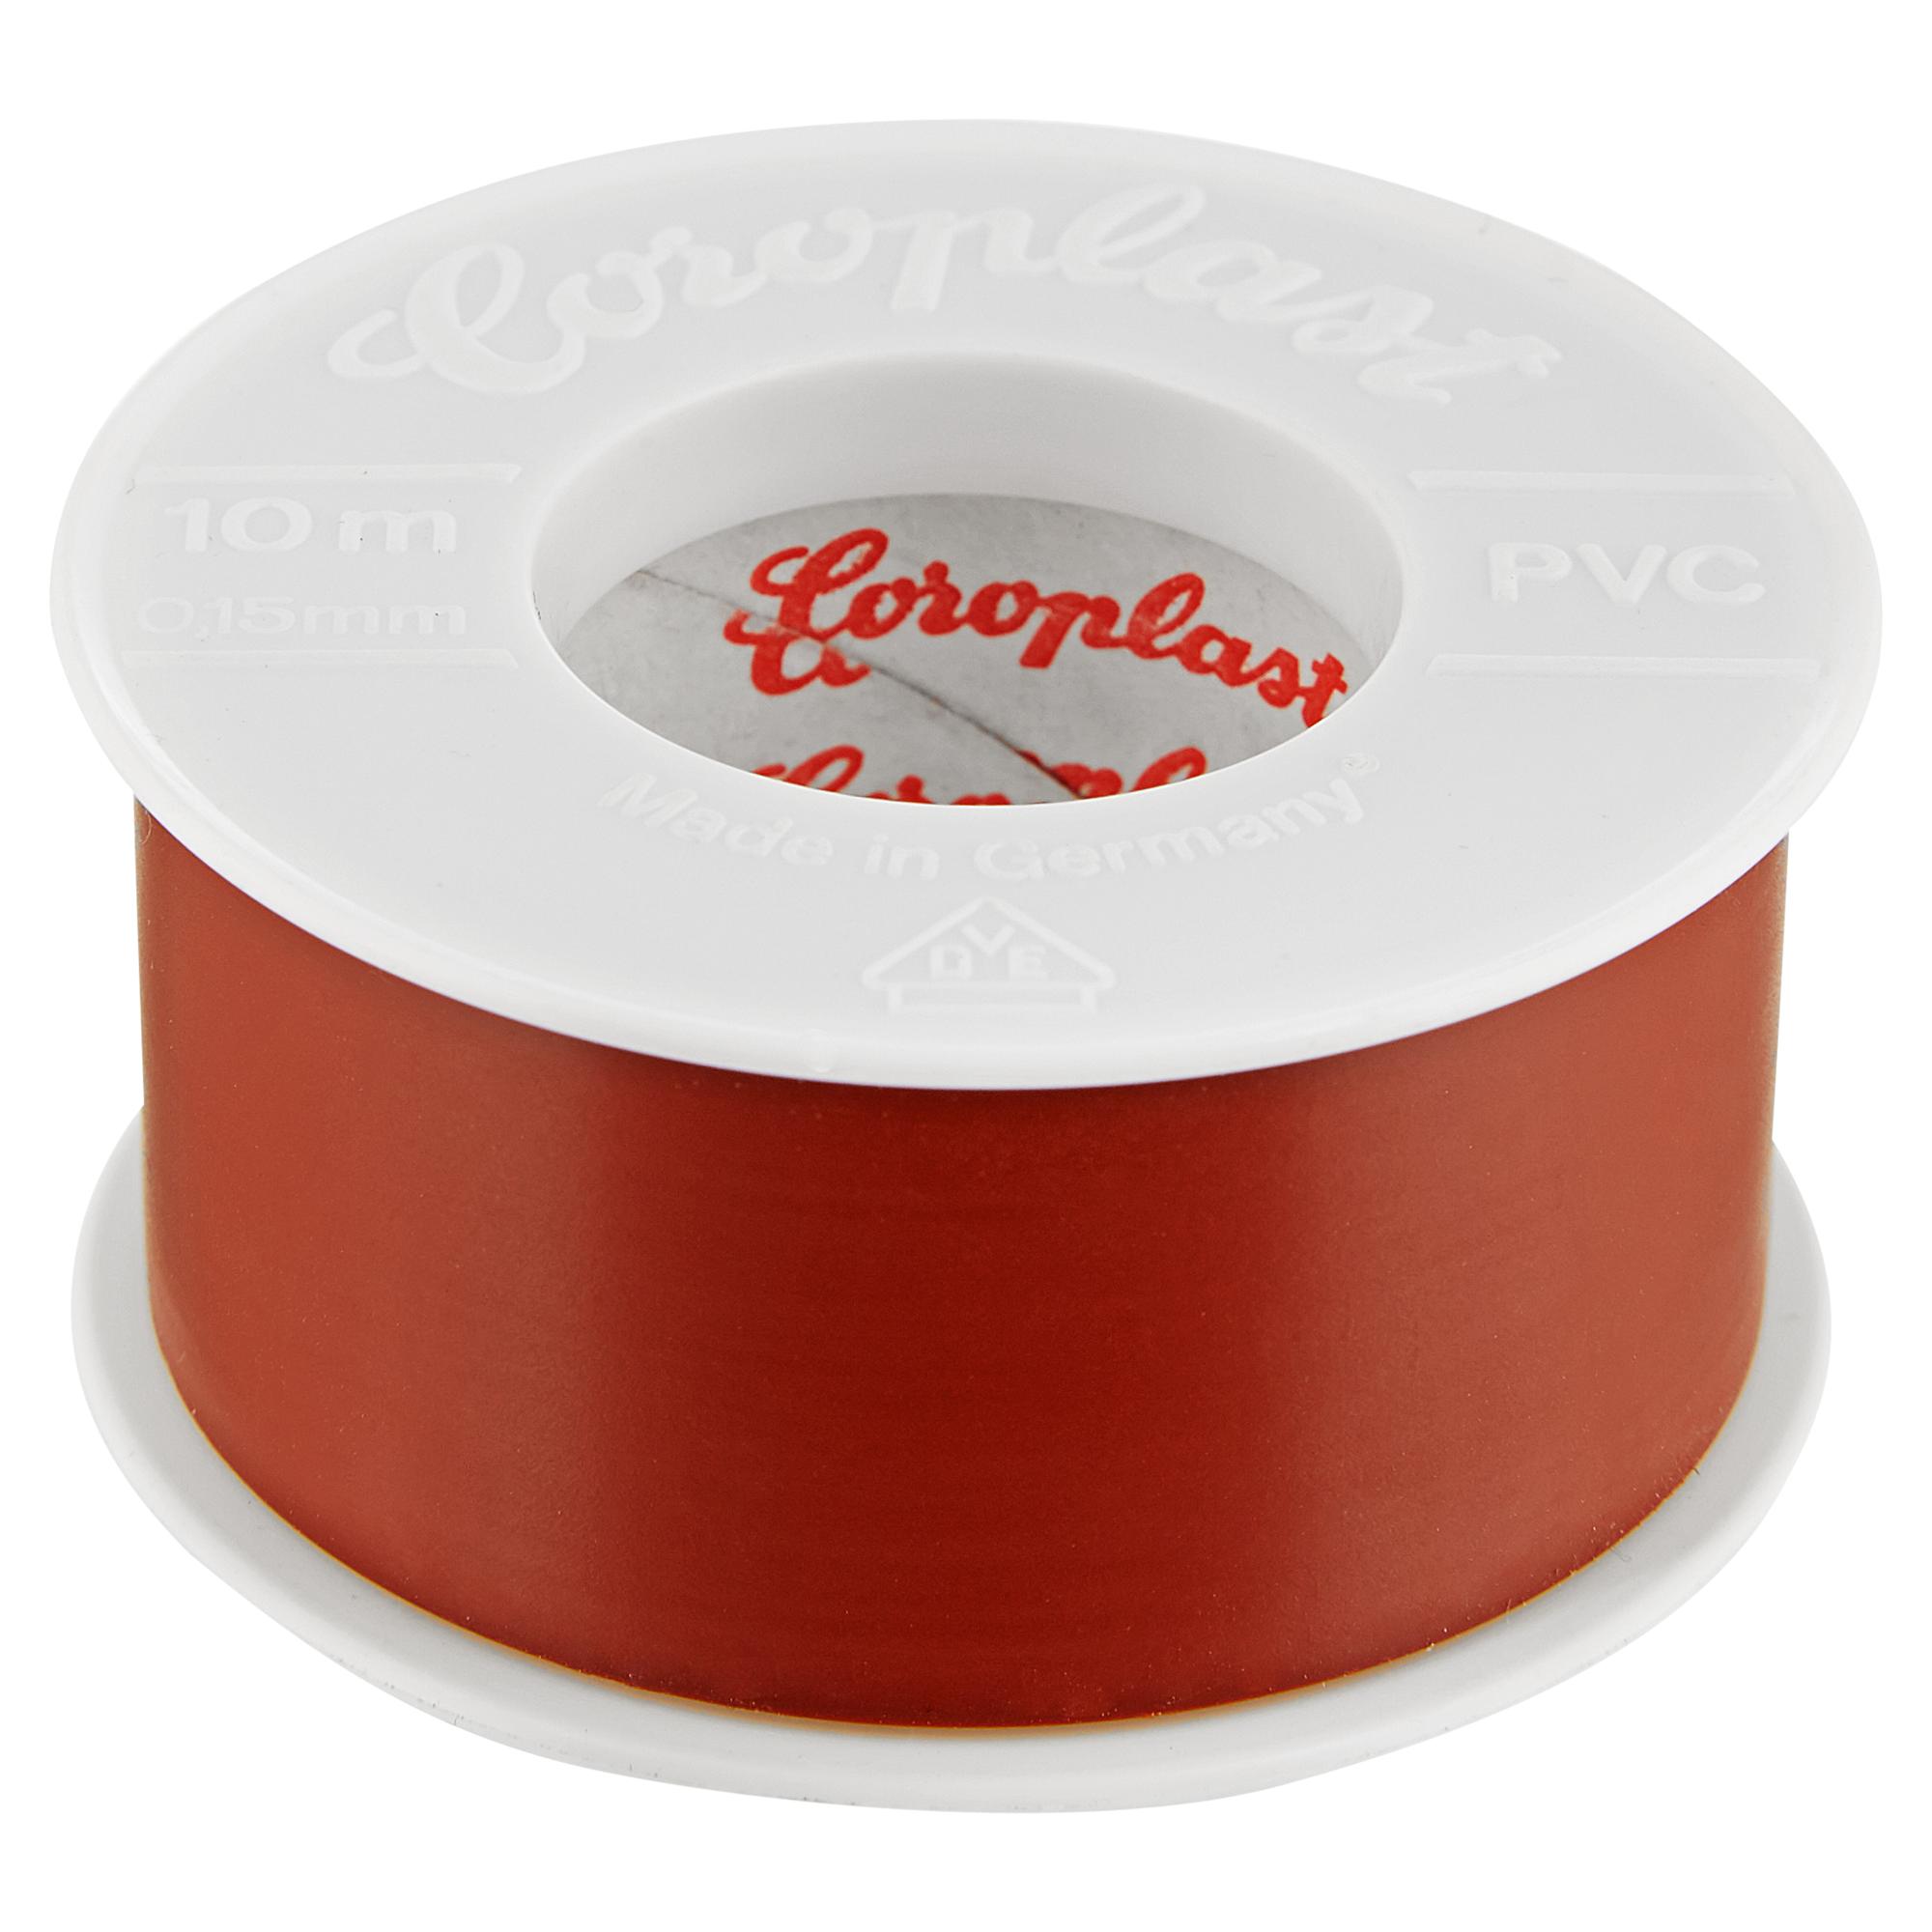 Coroplast Isolierband Braun 1000 X 2 5 X 0 015 Cm ǀ Toom Baumarkt